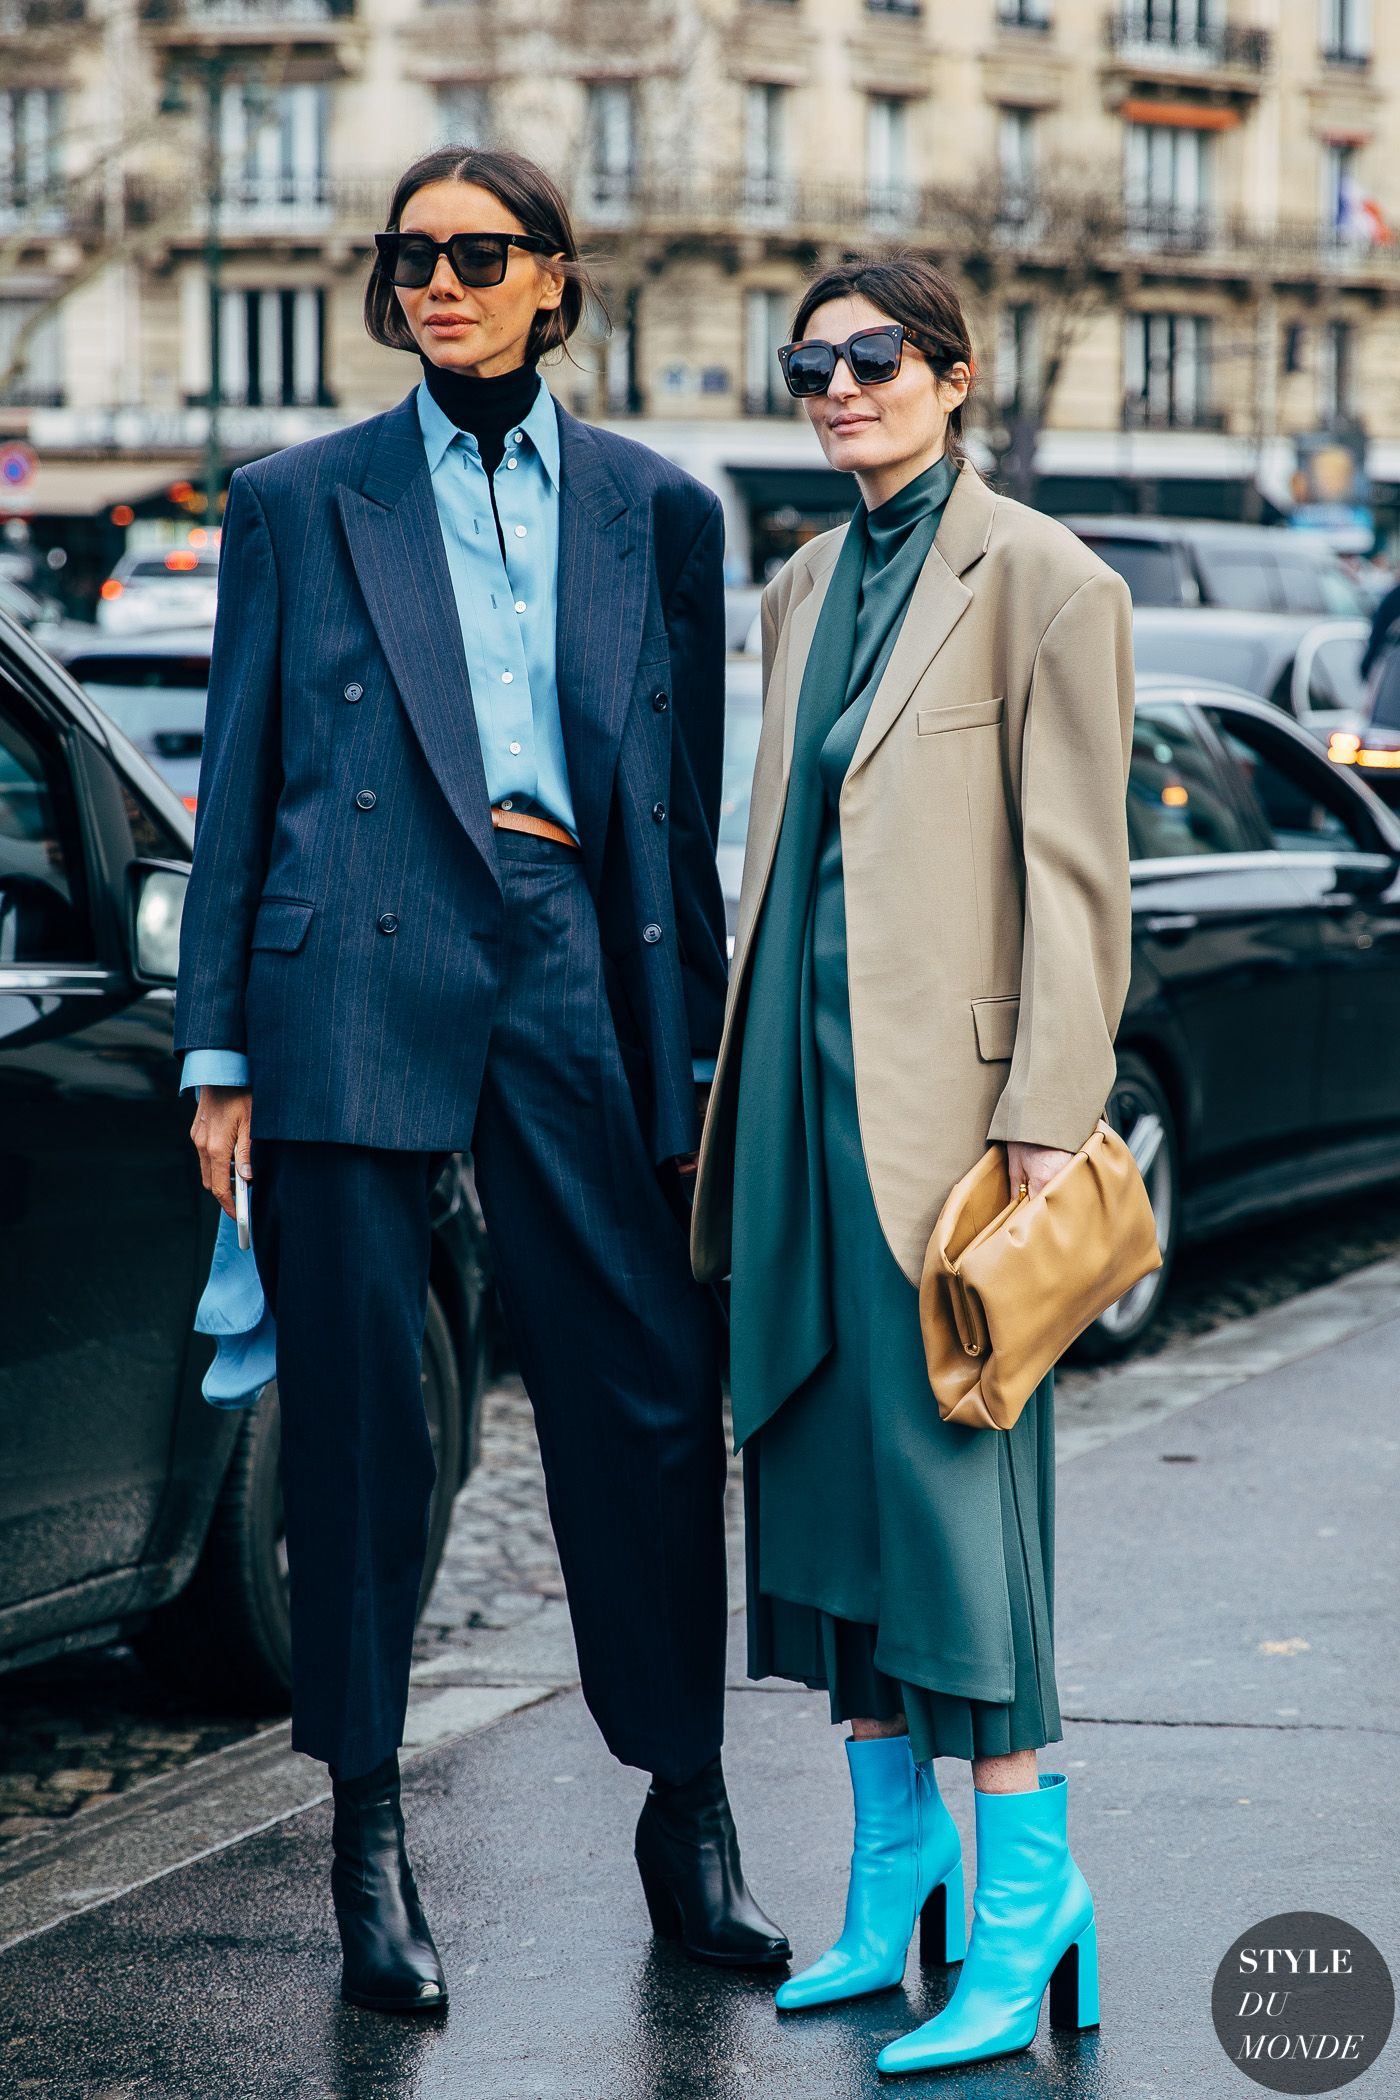 Paris FW 2019 Street Style: Julie Pelipas and Irina Linovich